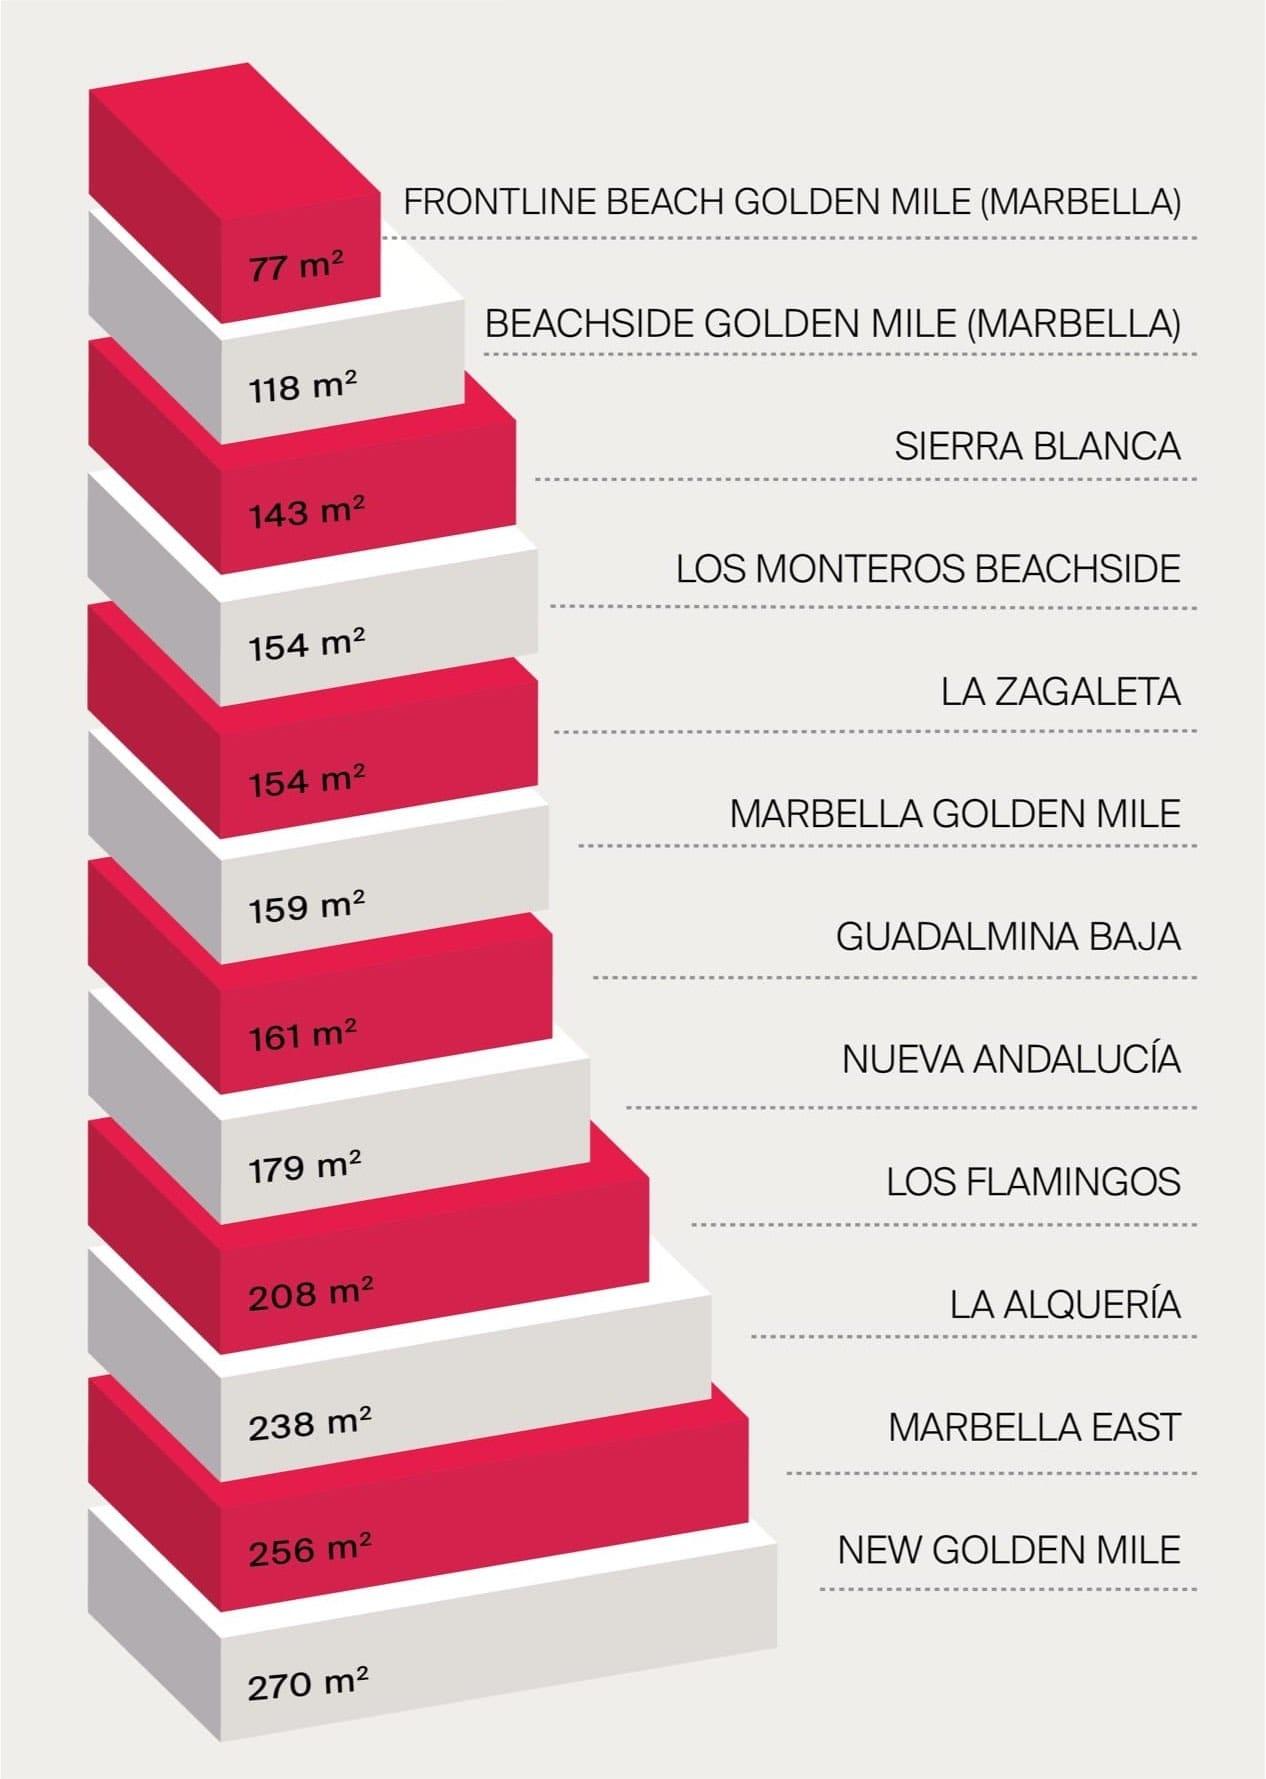 Comparative values in the Golden Triangle (Marbella, Estepona, Benahavís)